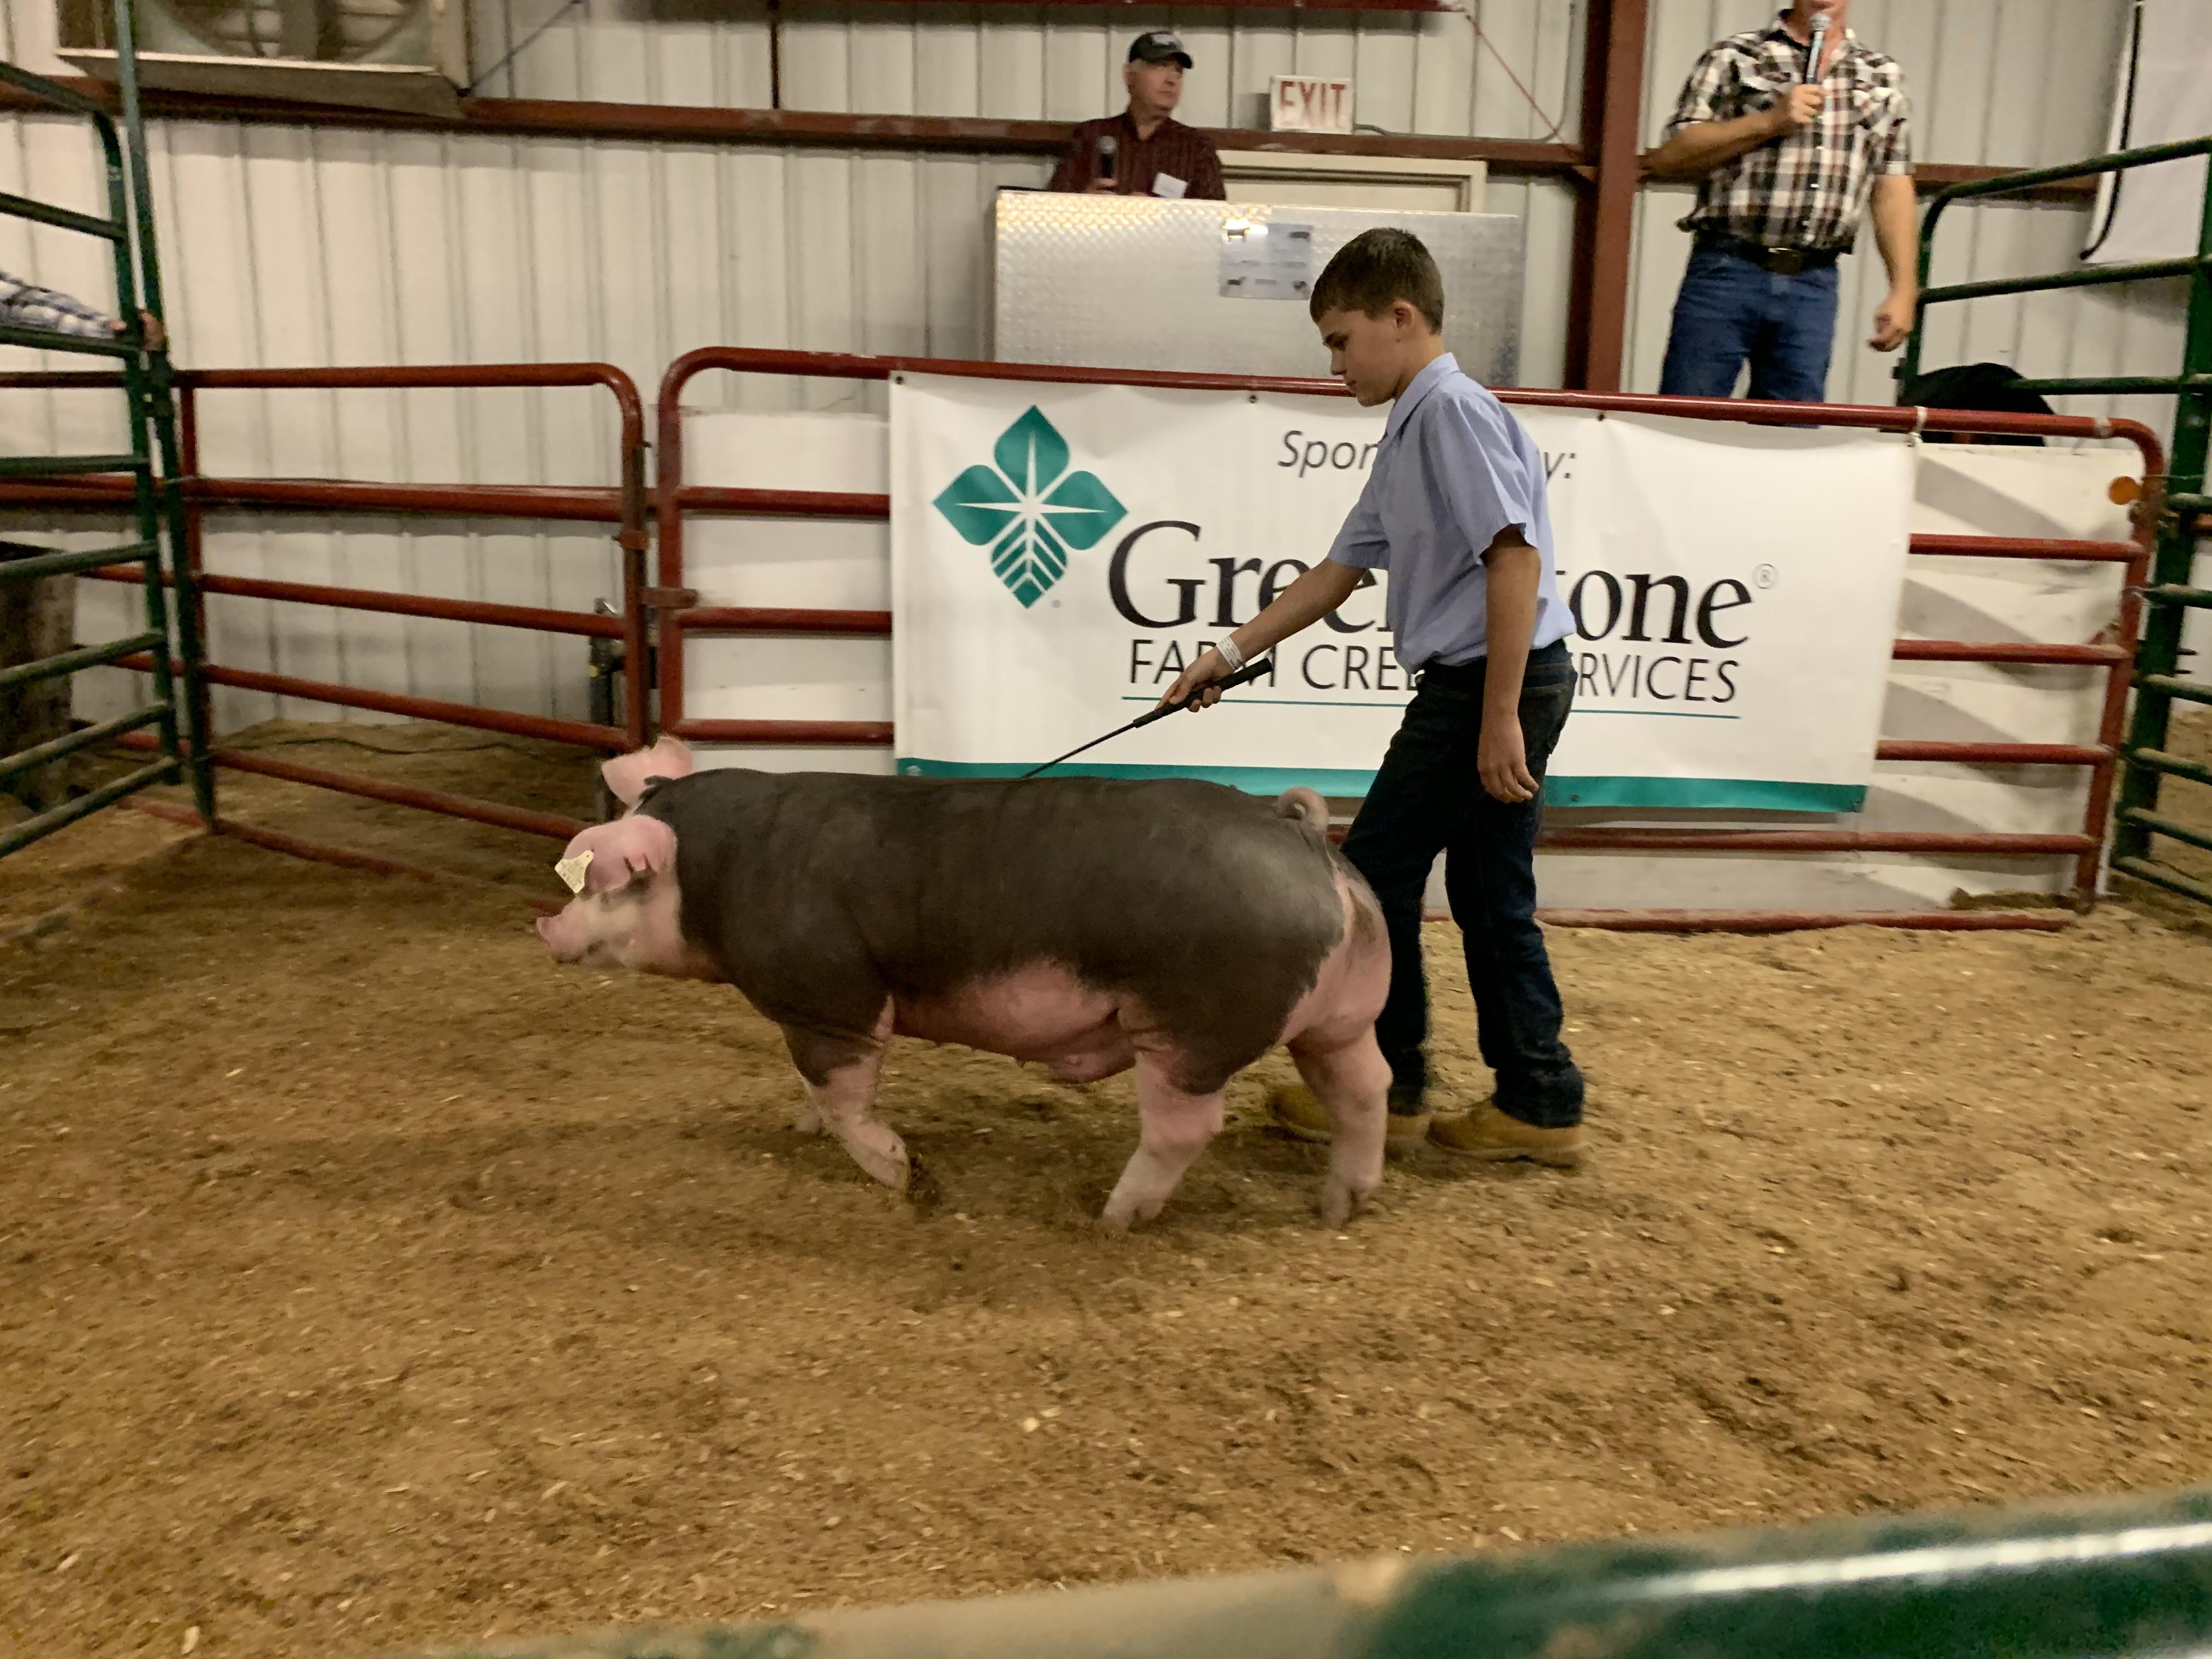 Gresham FFA member Charlie Huffman walks his hog around the ring as visitors bid on it during the livestock auction at the Shawano County Fair on Sept. 3.(Luke Reimer   NEW Media)